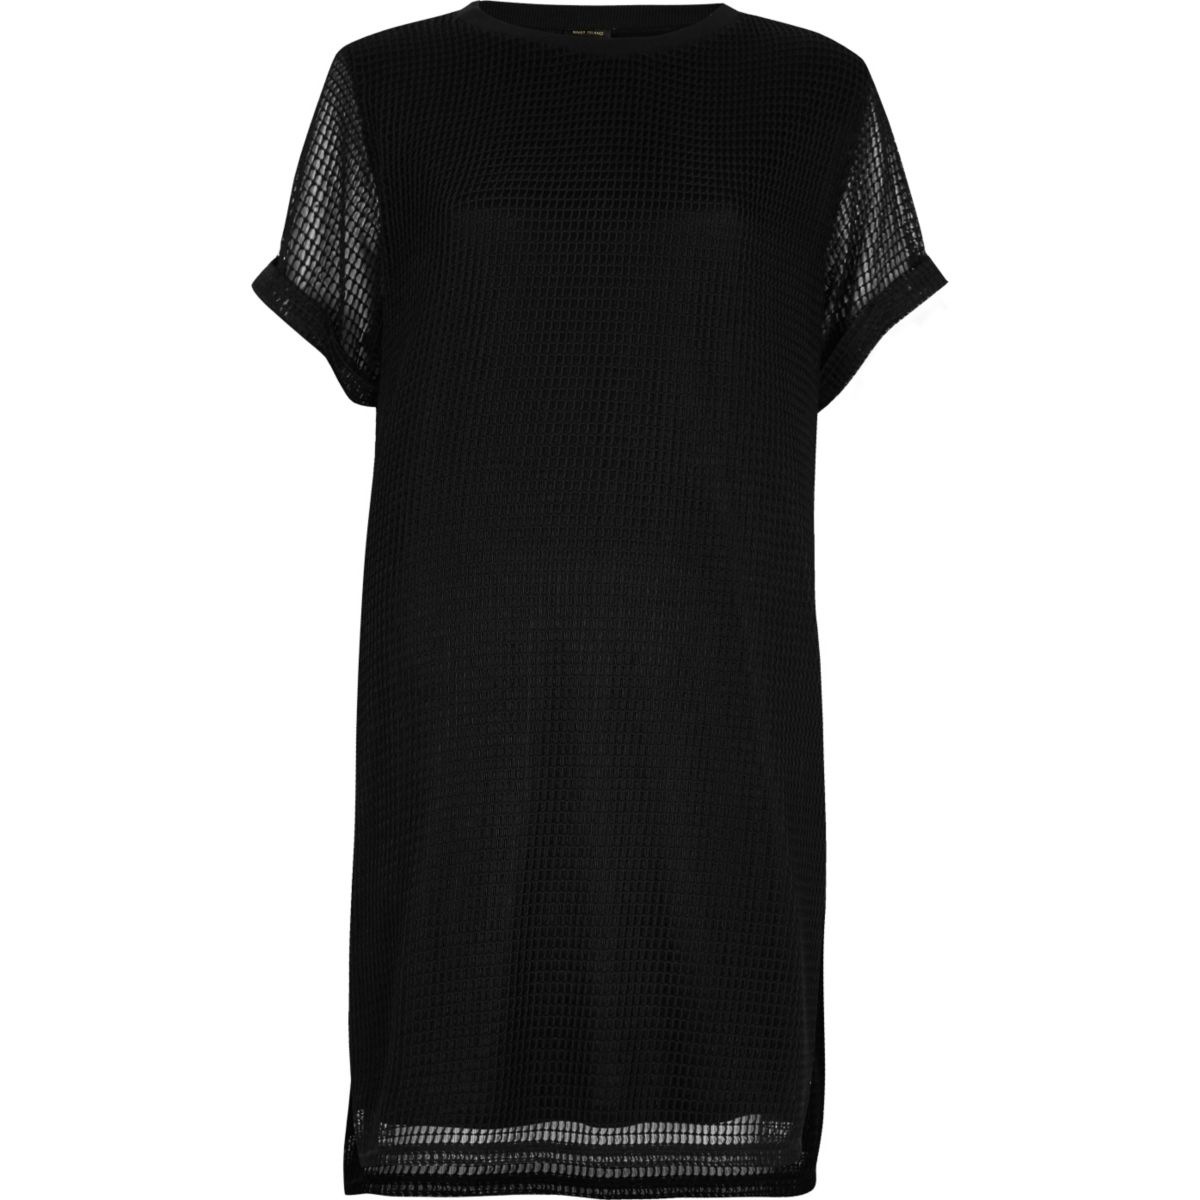 Black mesh t shirt dress dresses sale women for Black studs for dress shirt